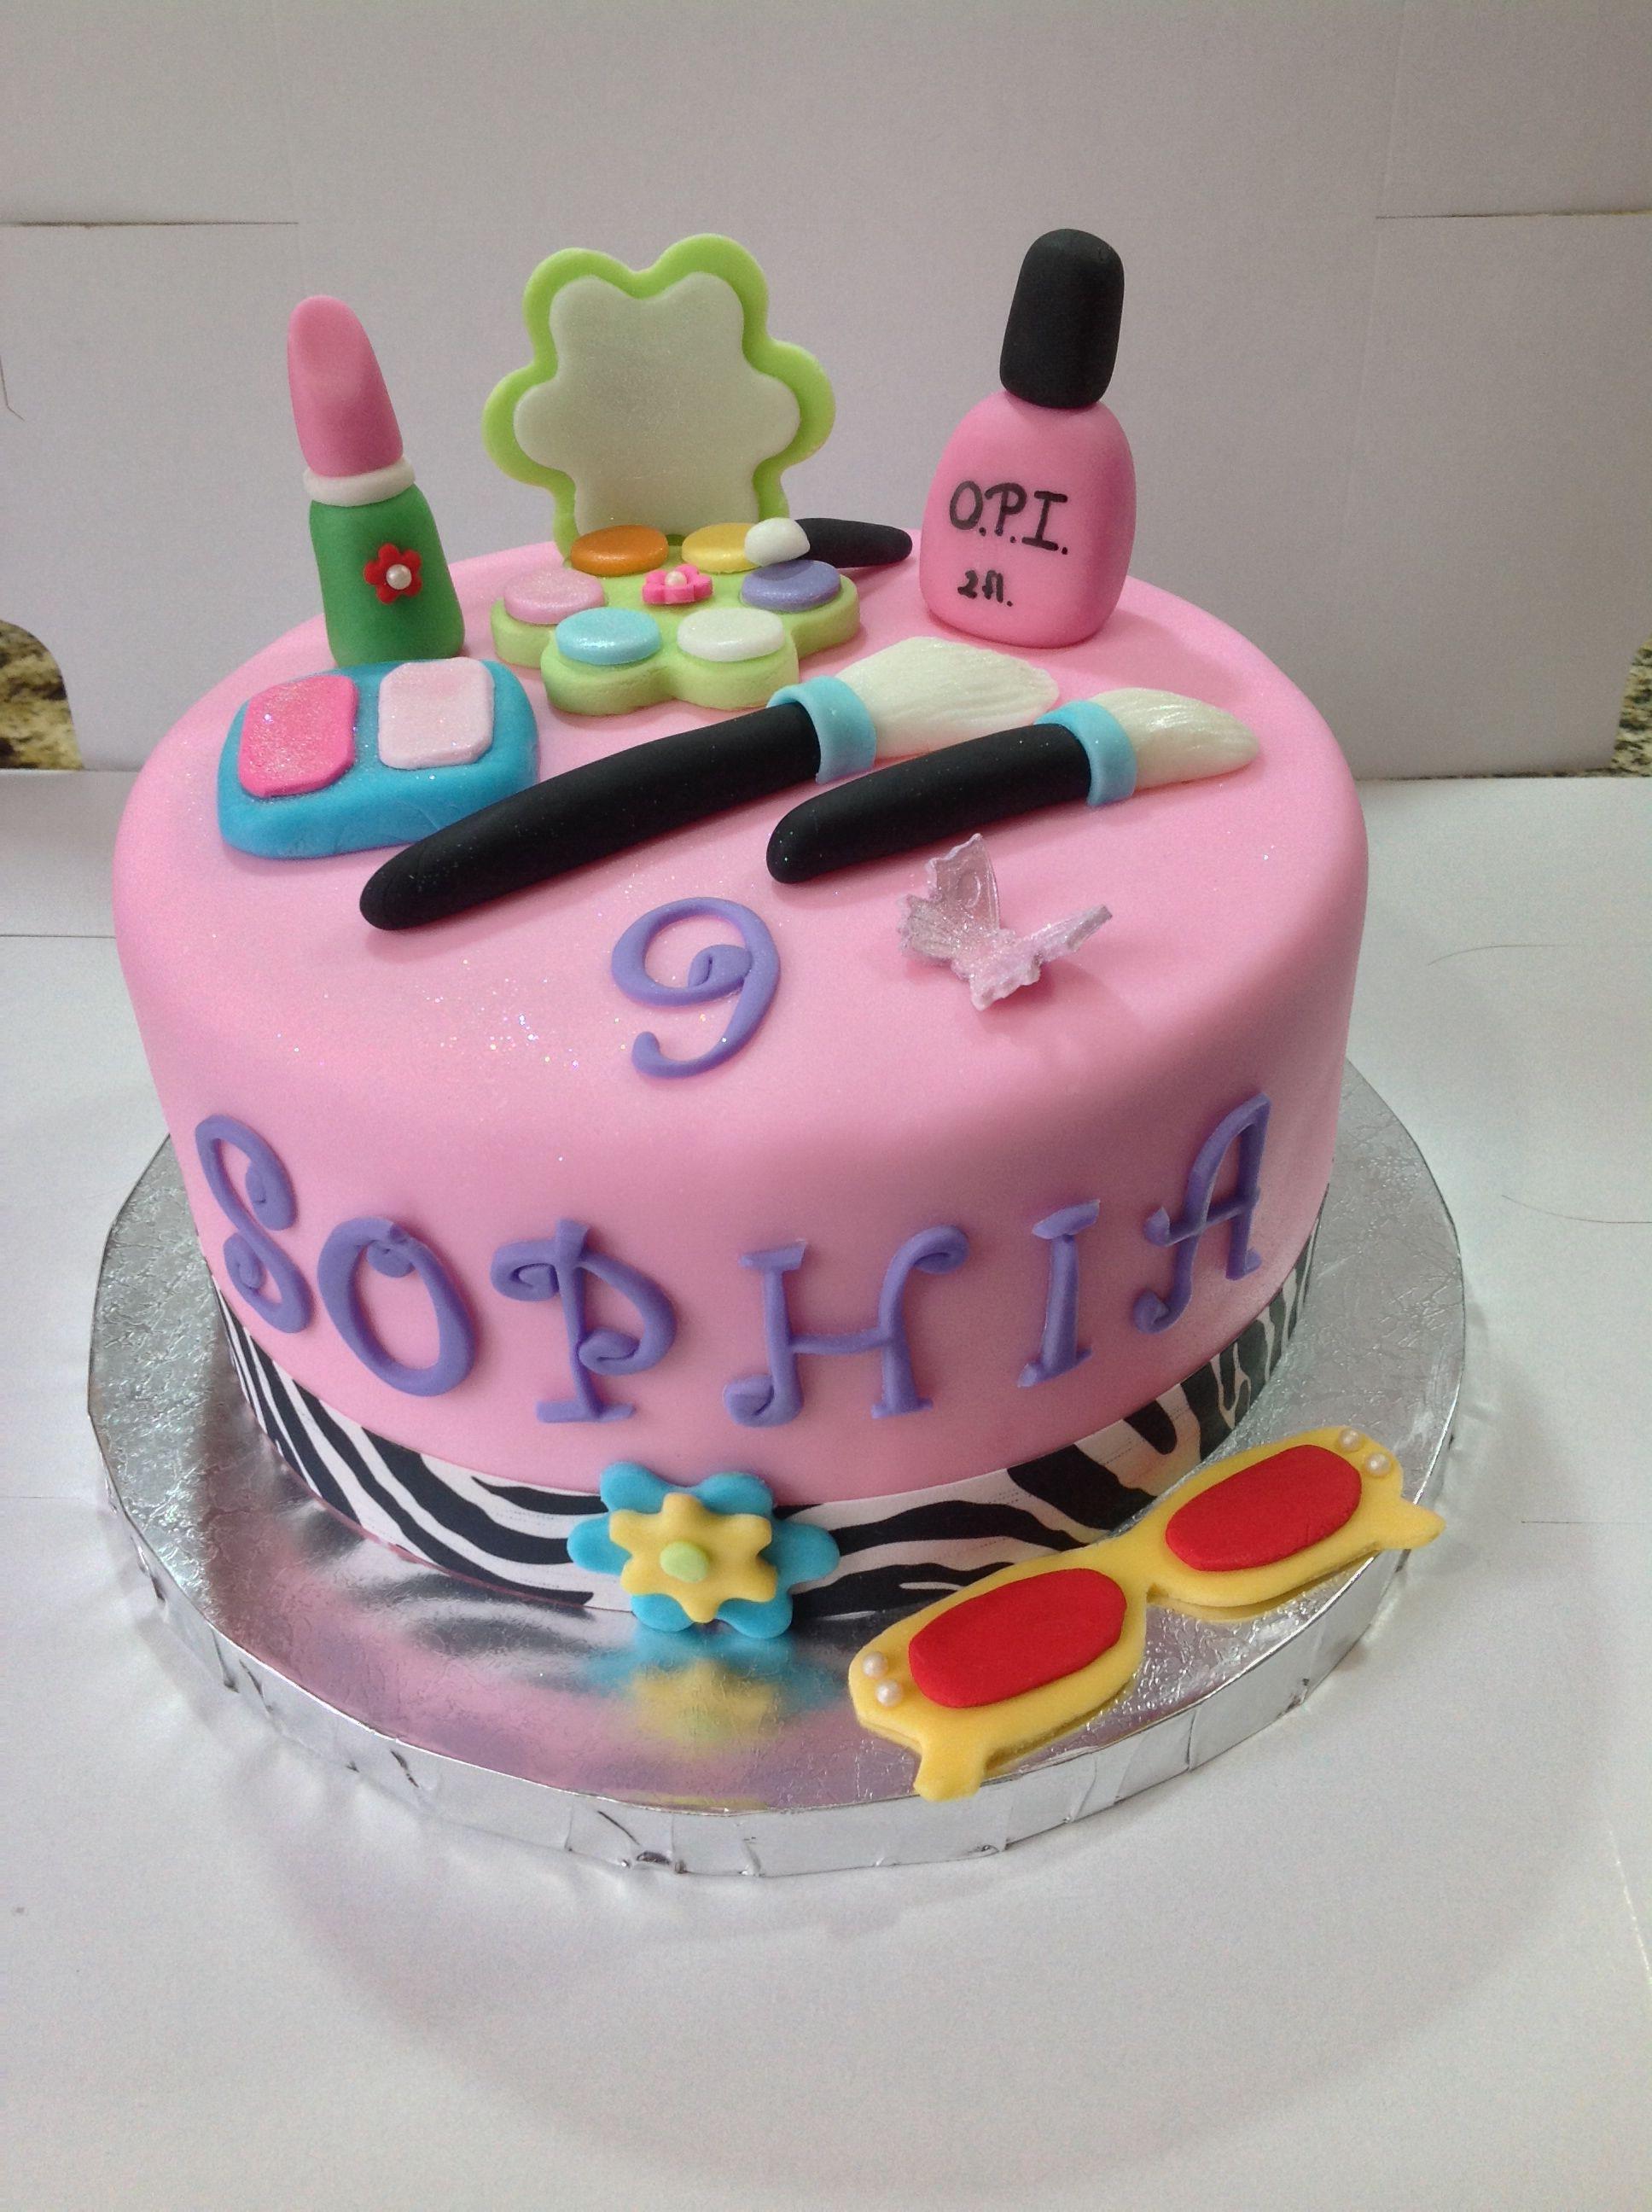 Tremendous Little Girls Make Up Cake With Images Make Up Cake Kids Cake Personalised Birthday Cards Paralily Jamesorg